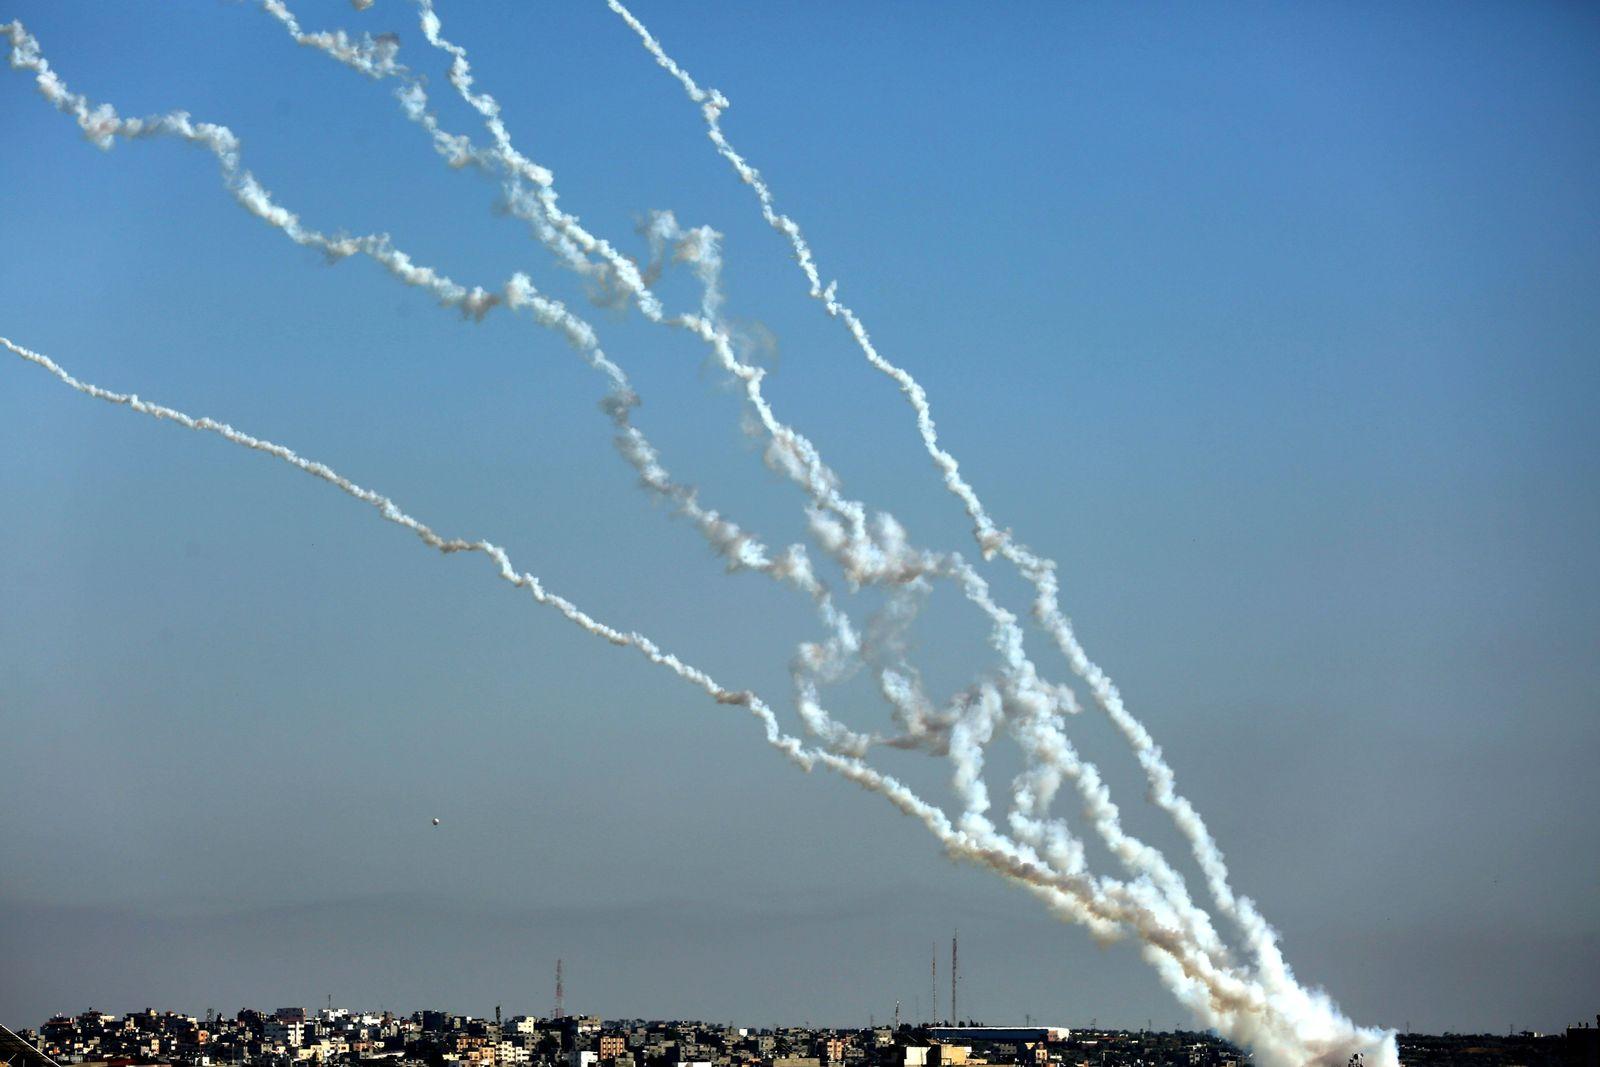 May 19, 2021, Gaza, Gaza Strip, Palestinian Territory: Rockets are launched from Gaza City, towards Israel on May 19, 2